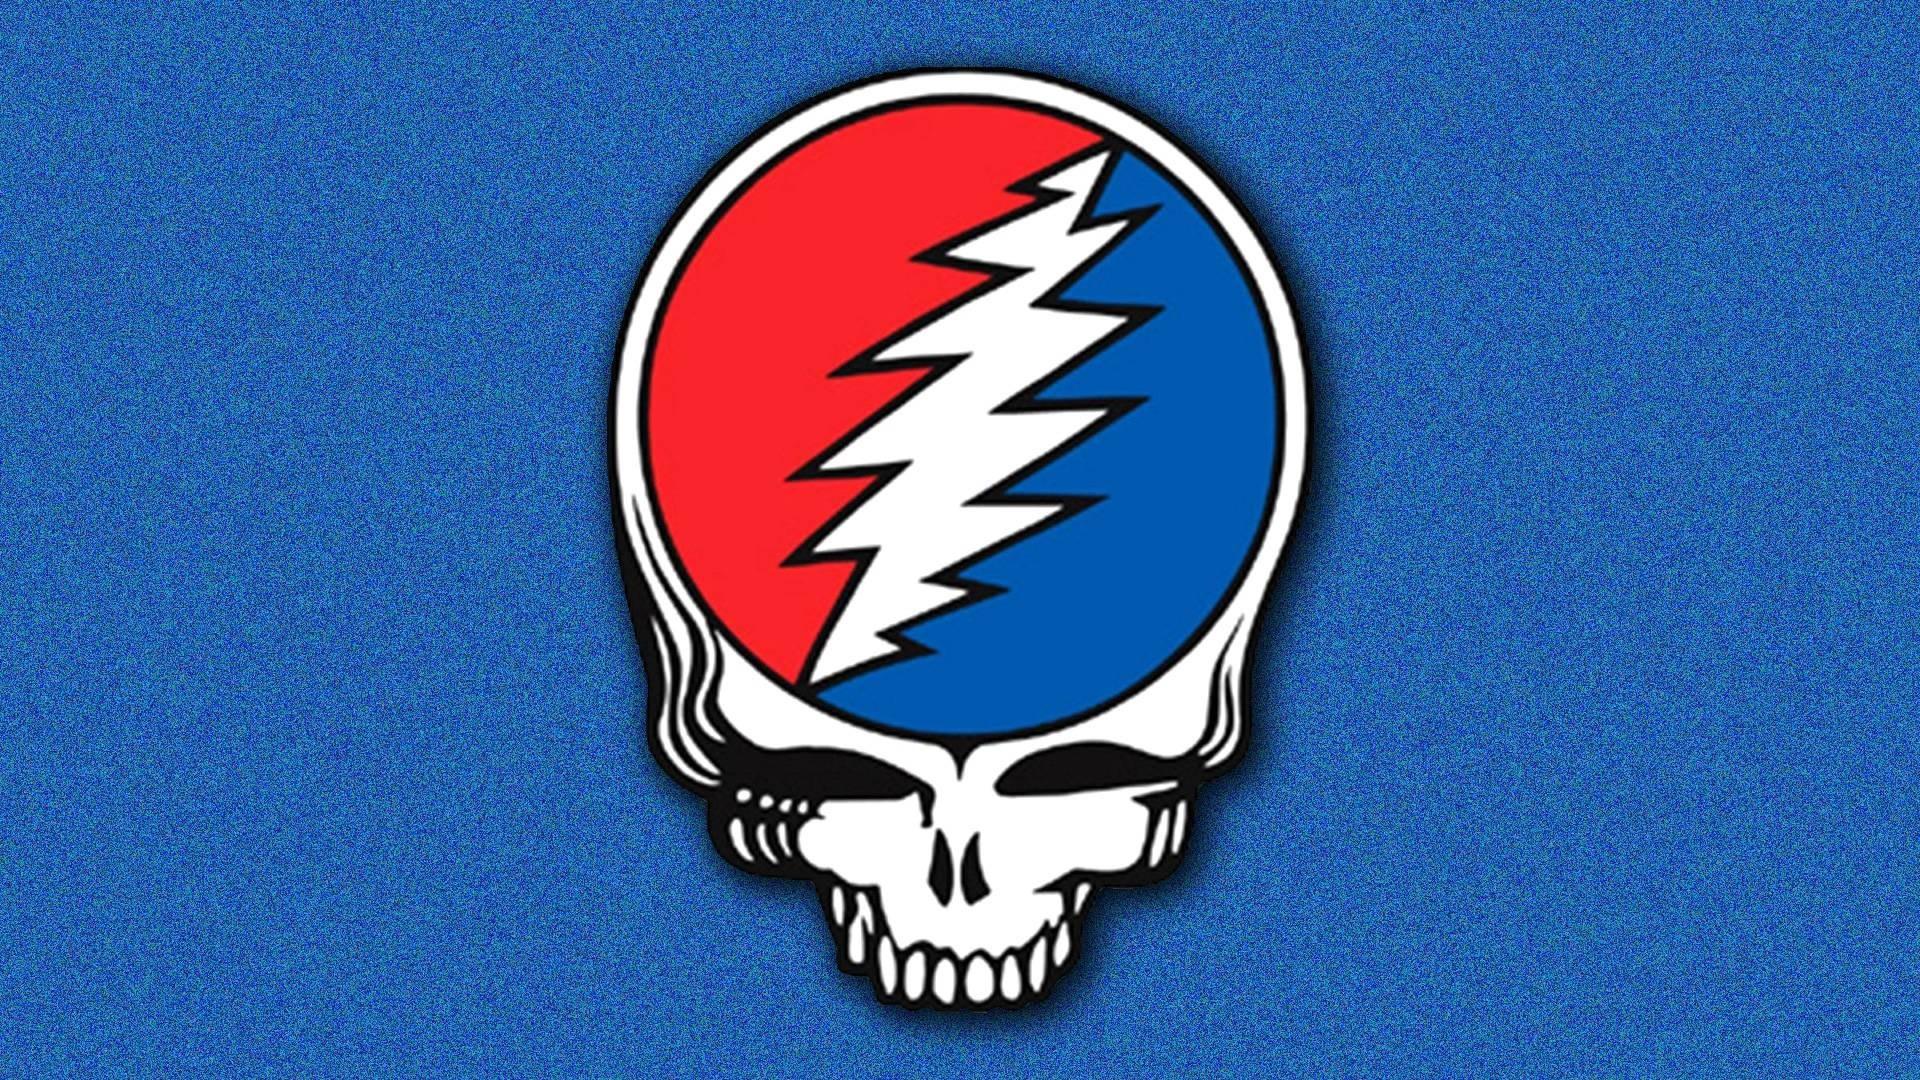 Grateful Dead wallpaper ·① Download free amazing ...